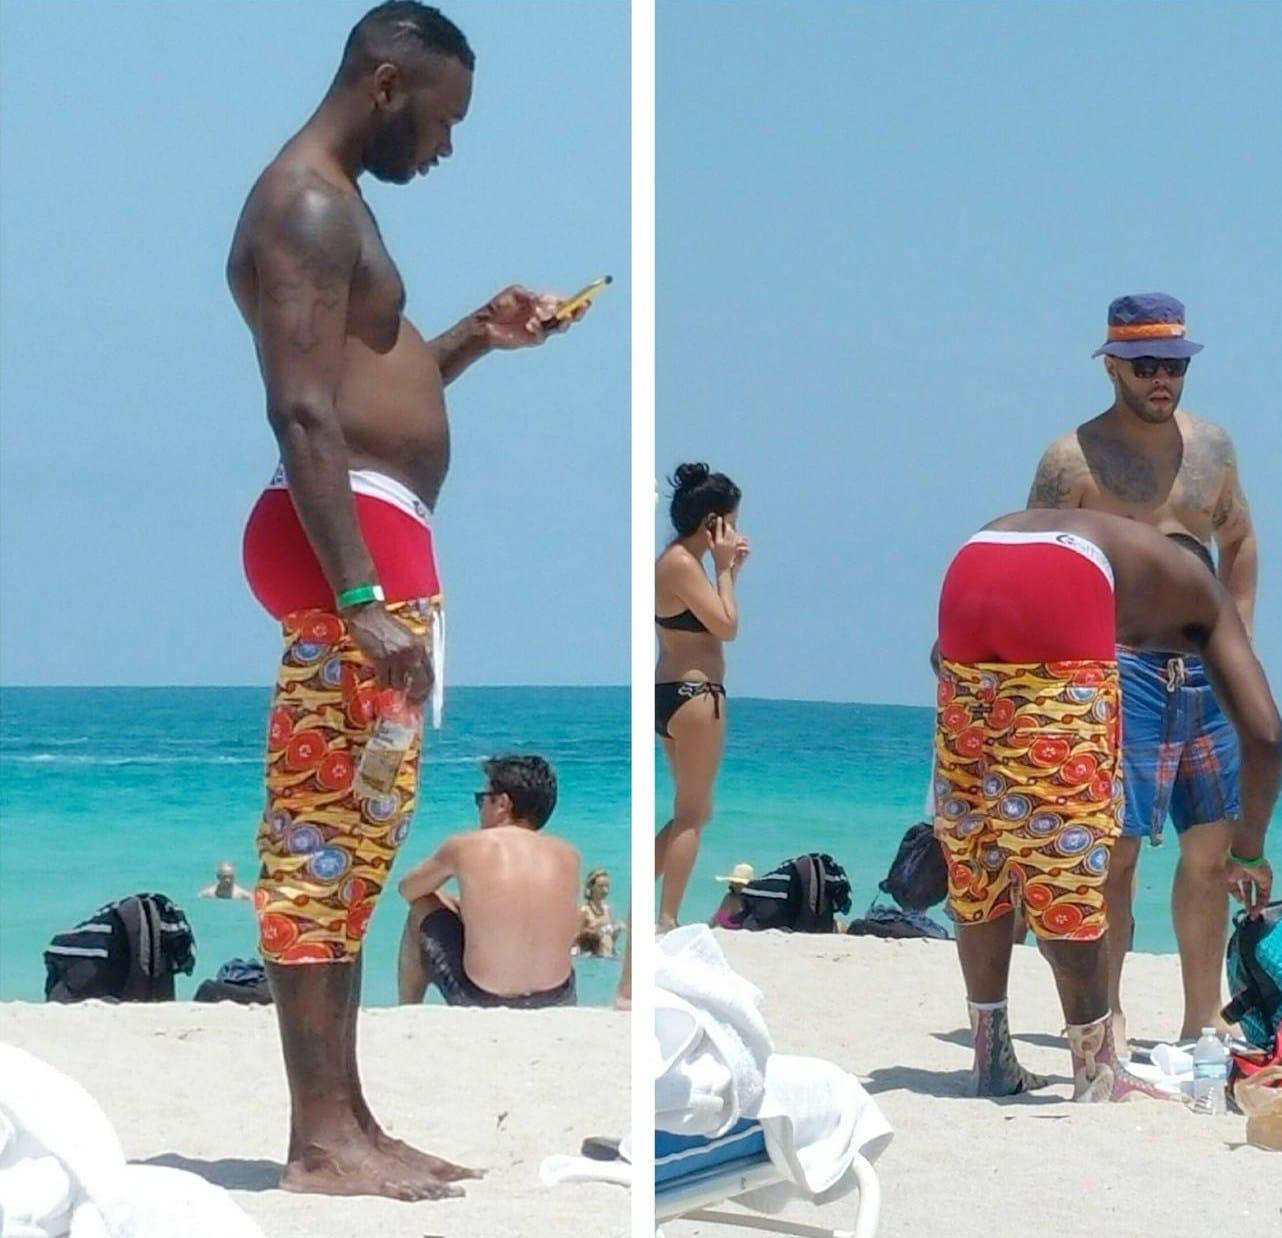 чернокожий парень на пляже